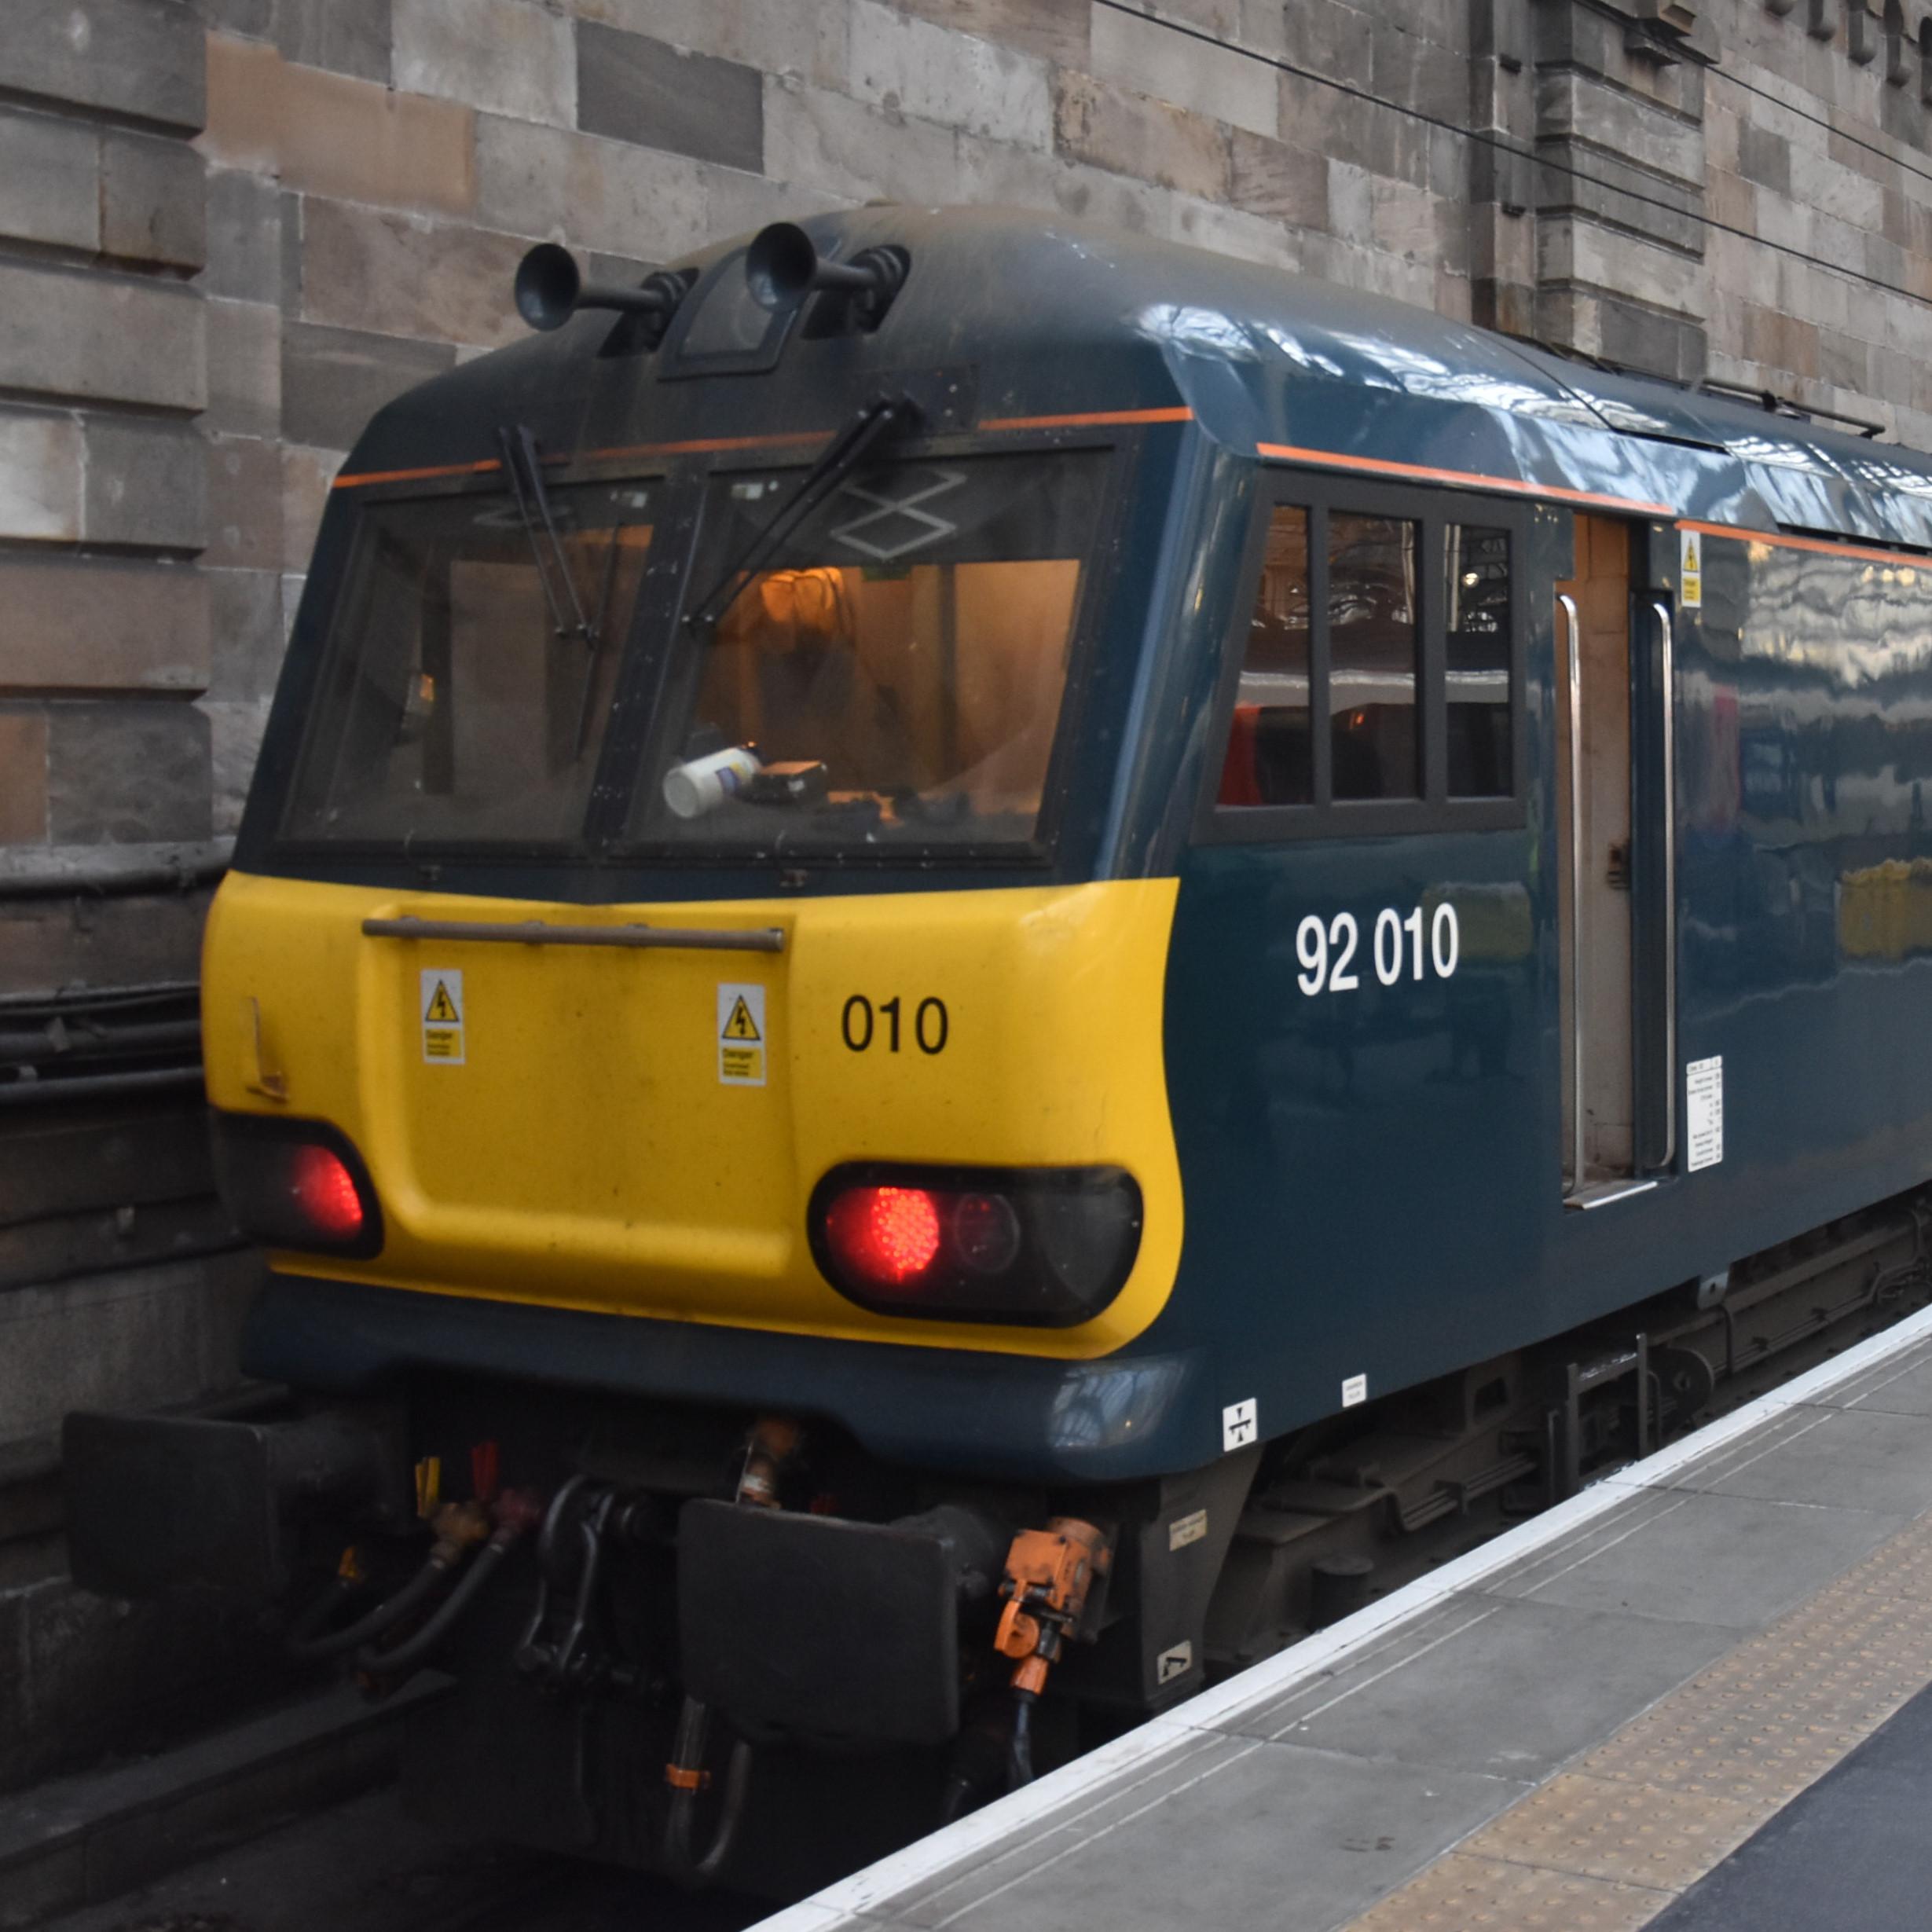 Brian's Travel Spot: Caledonian Sleeper to Glasgow